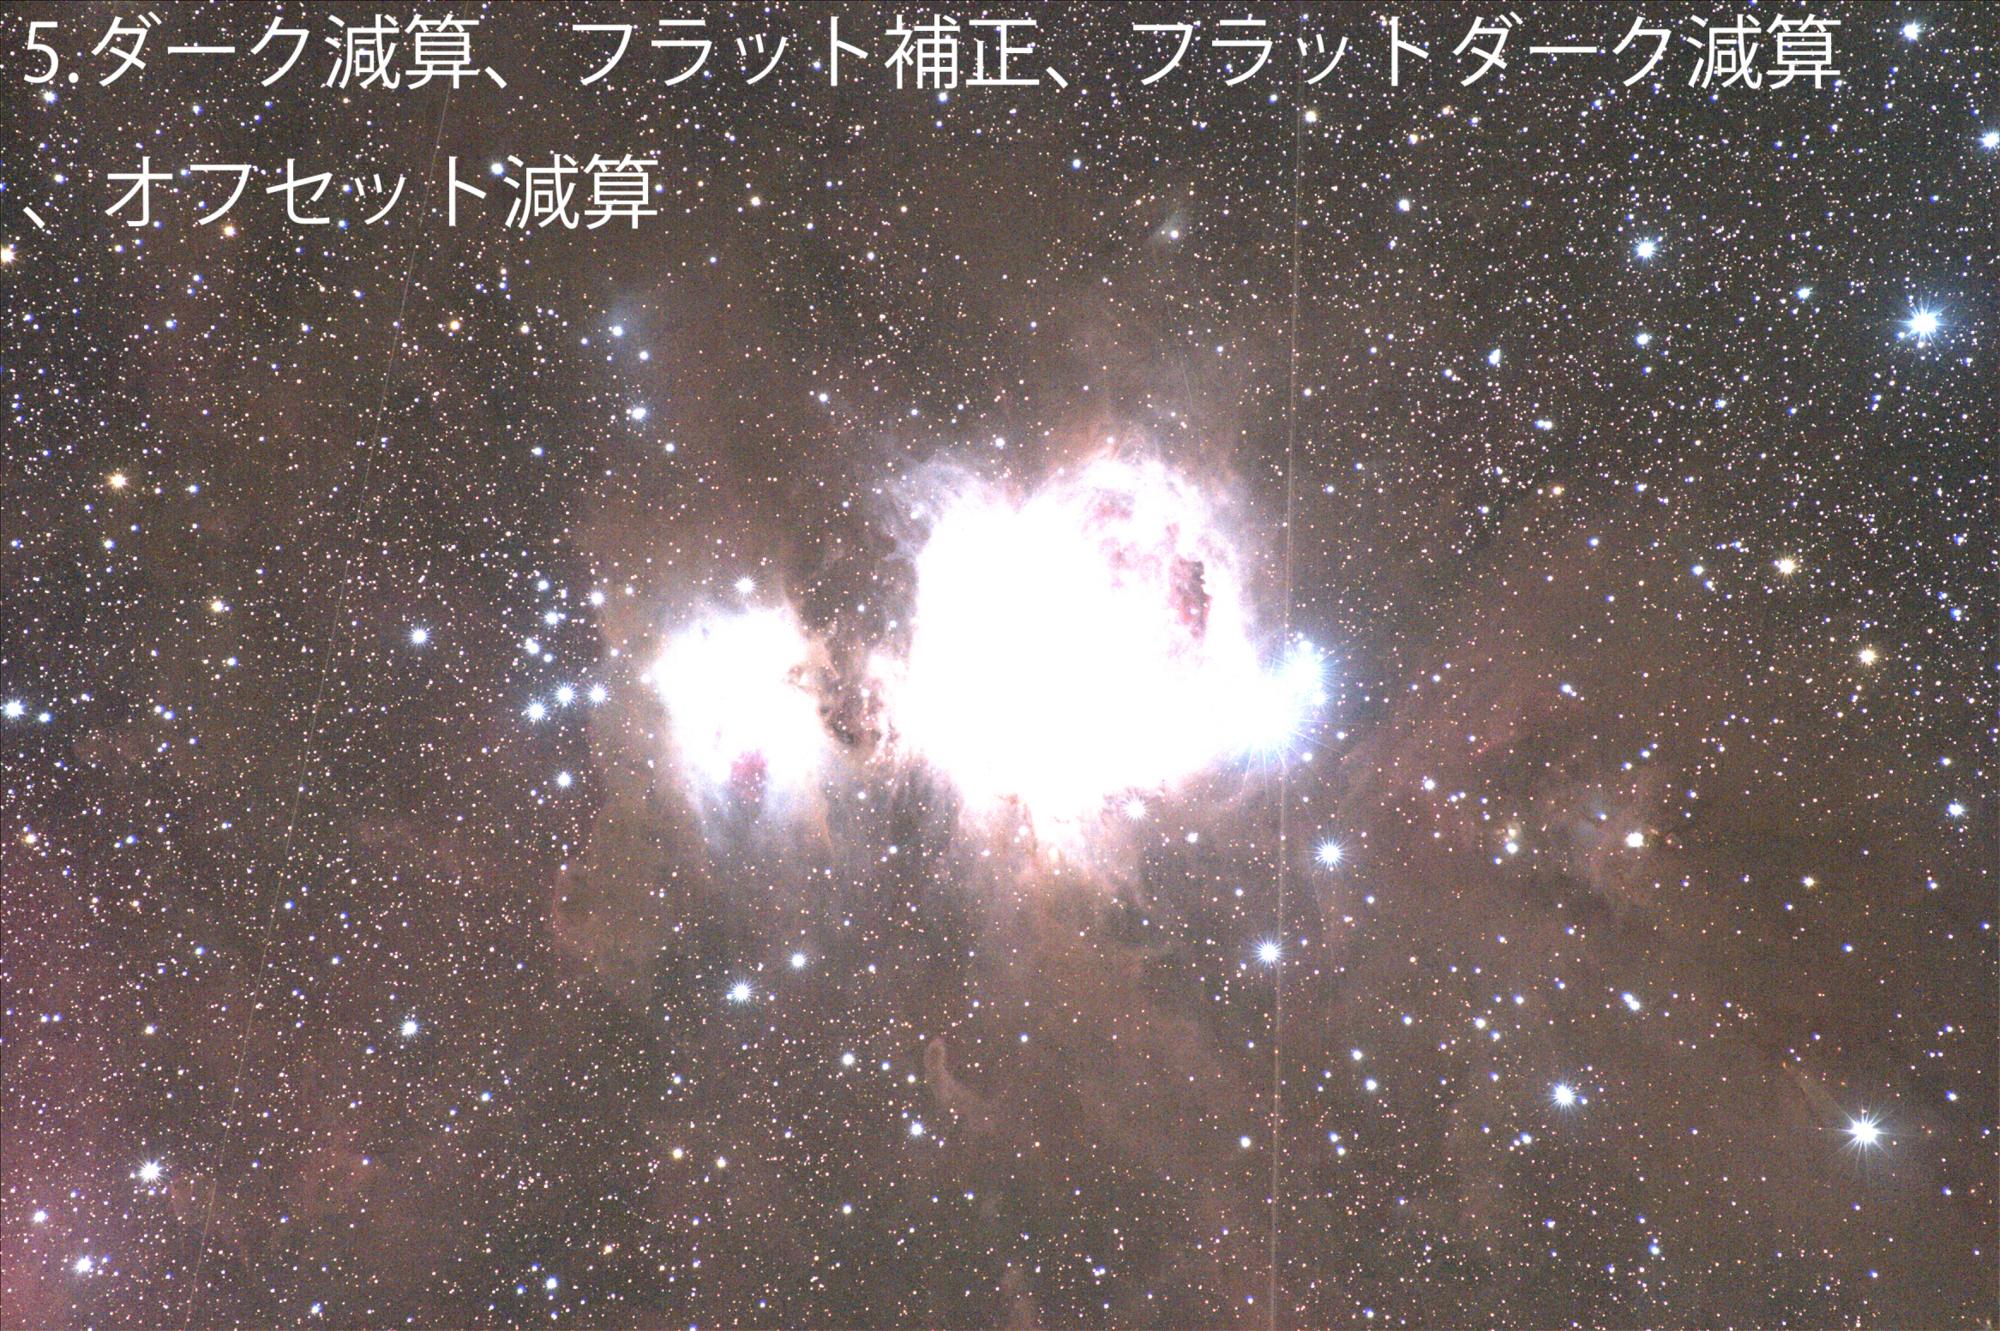 f:id:snct-astro:20171210224947j:plain